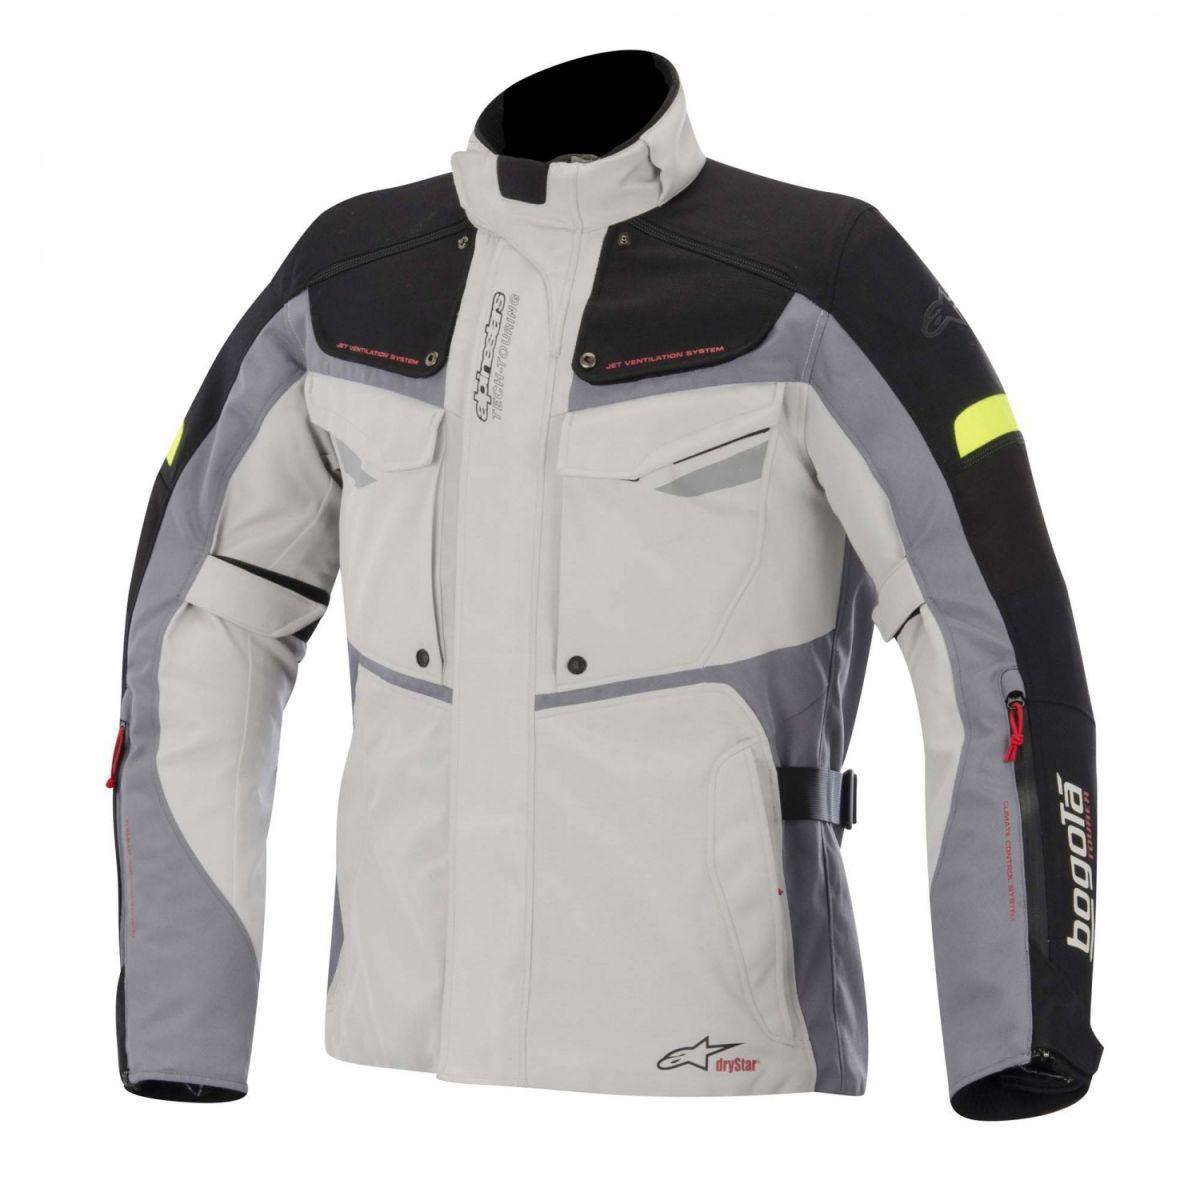 Jaqueta Alpinestars Bogotá Drystar® WP Cinza, Preta e Amarelo/impermeável (COMPRE JUNTO!) para Big Trail  - Super Bike - Loja Oficial Alpinestars